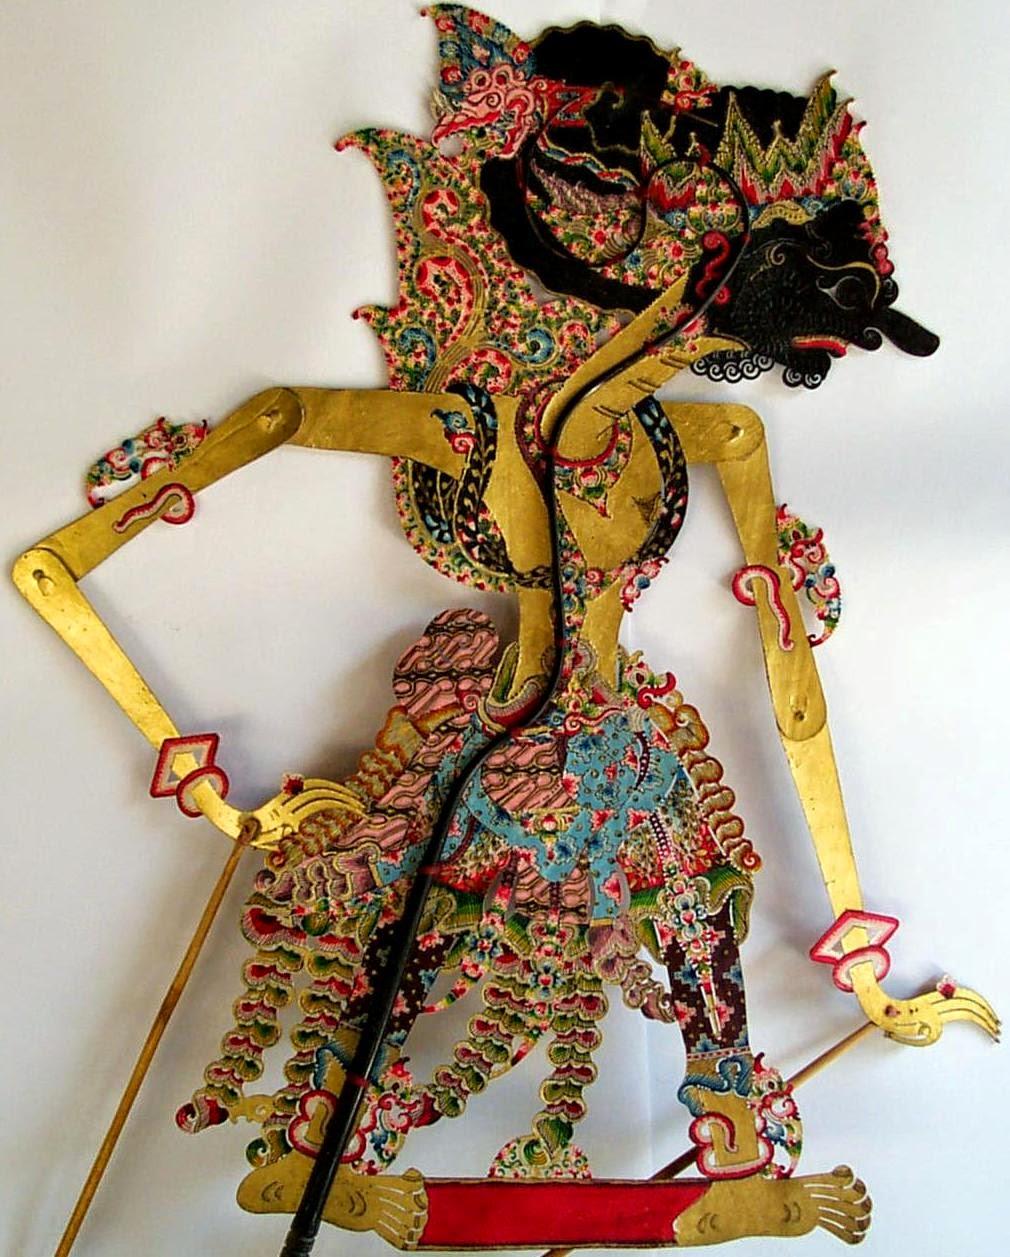 Jayadrata dudu wargane Kurawa kang cacah  Jayadrata (Bahasa Jawa)